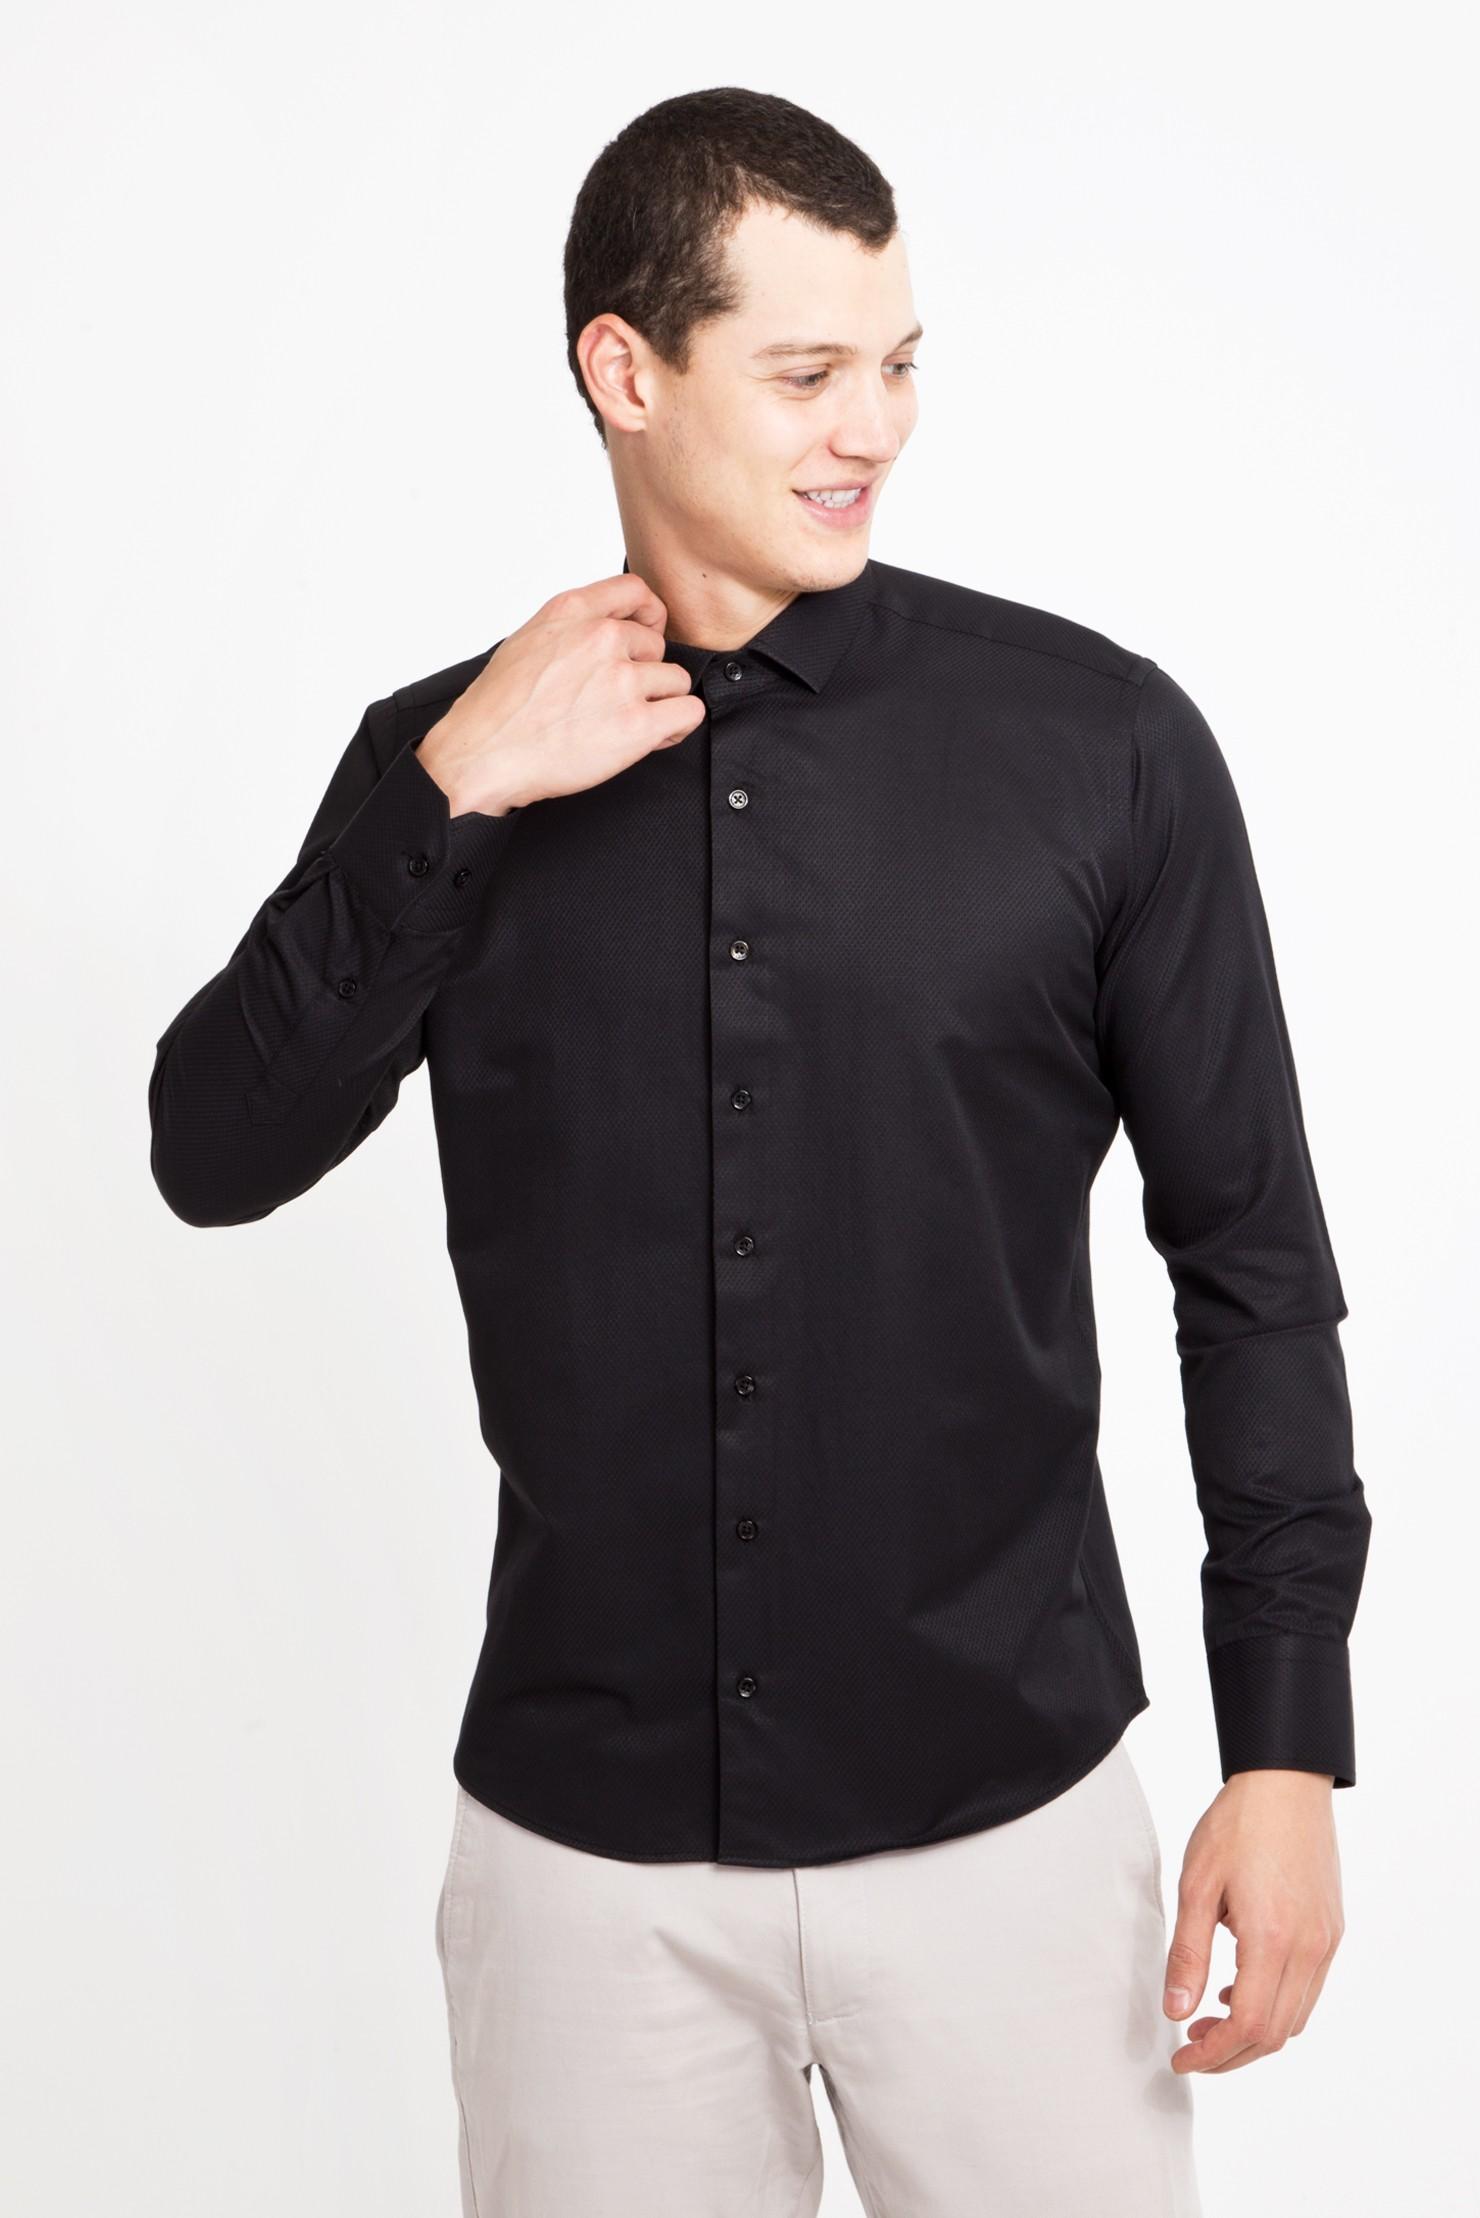 Kigili Menswear Dress Shirts Black Long Sleeve Plaid High Quality Slim Fit Spread Collar Made In Turkey